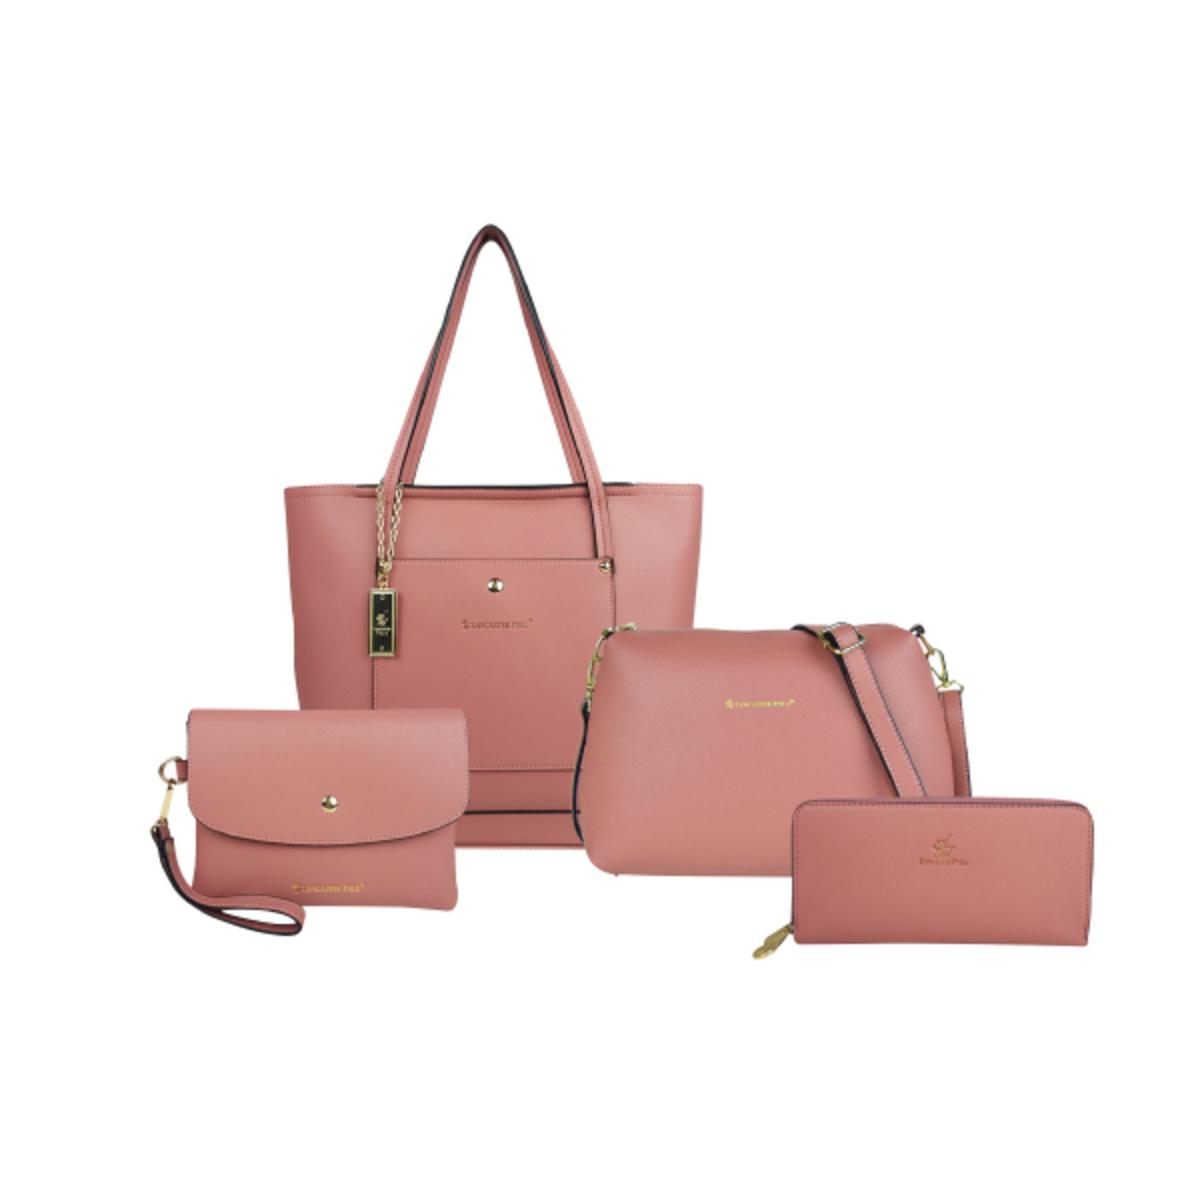 054c799d45 Lancaster Polo Tuscany Handbags set | Go Shop